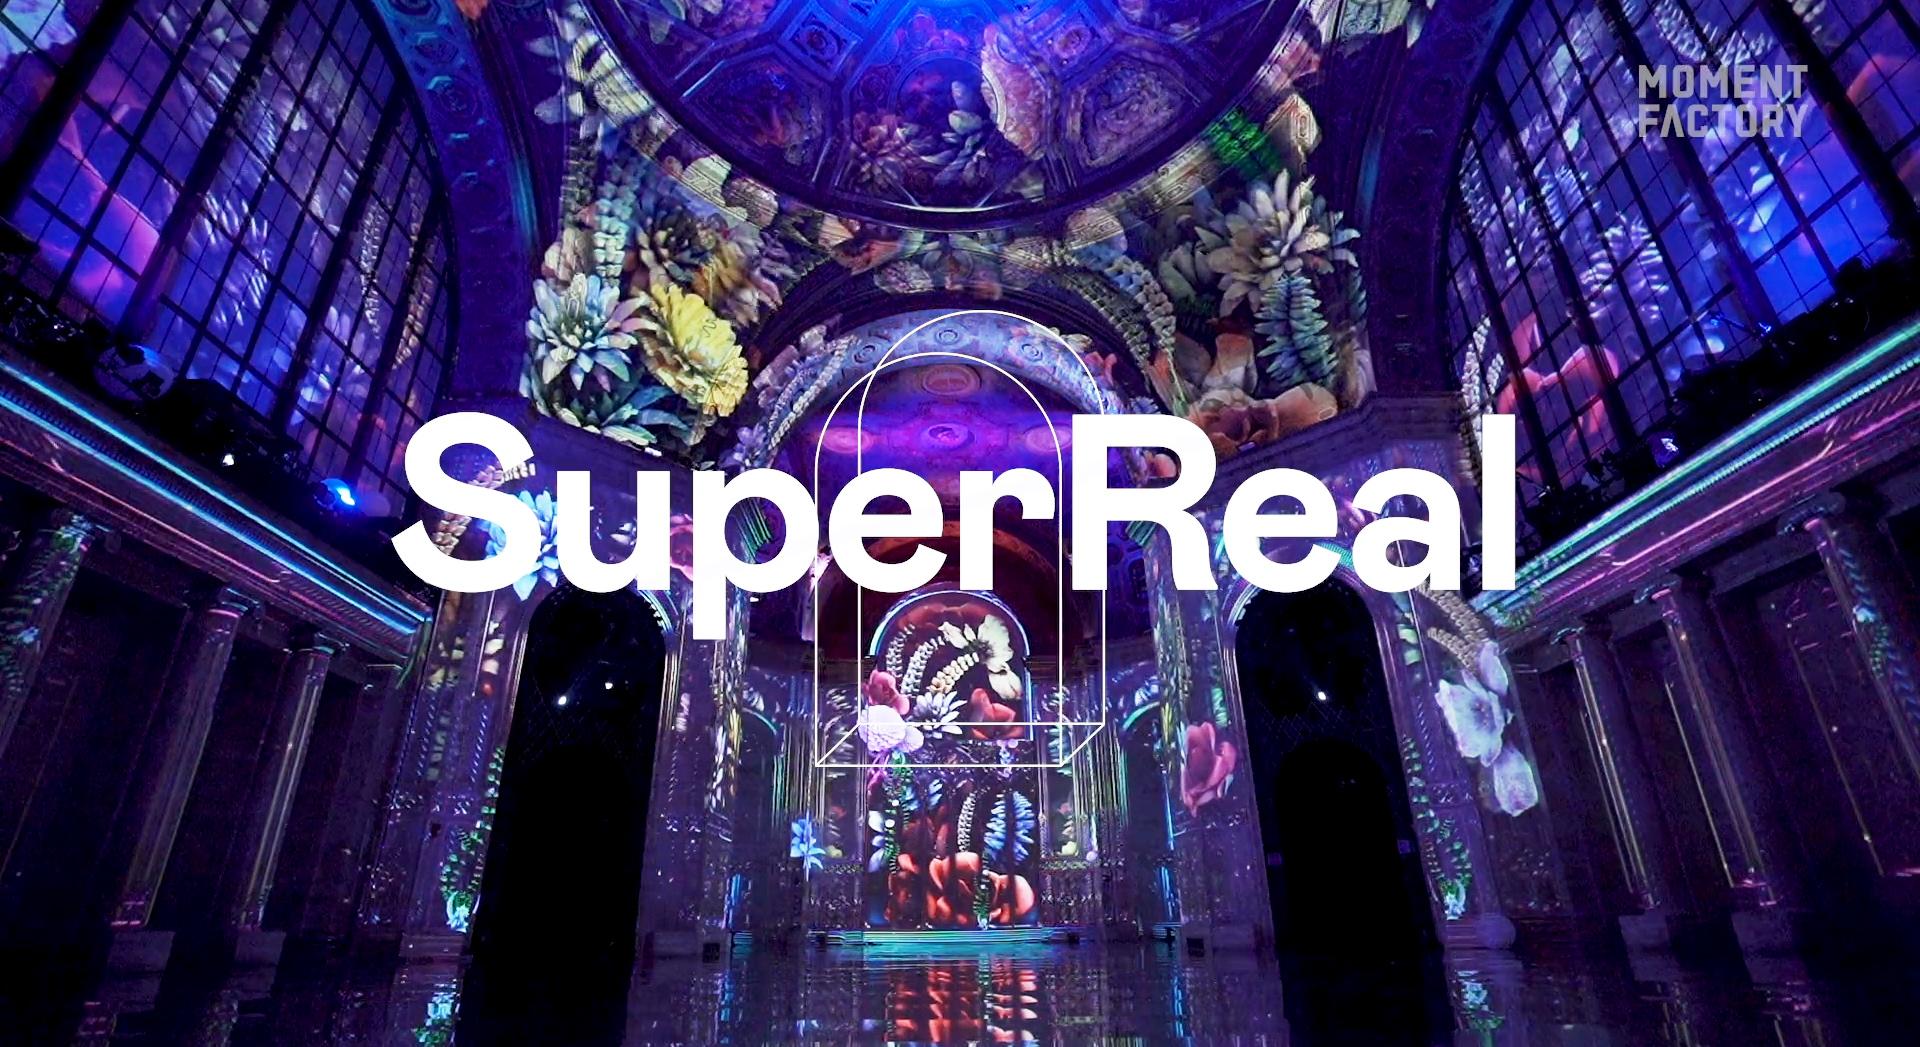 Bombastisches Multimedia Erlebnis von Moment Factory: SuperReal